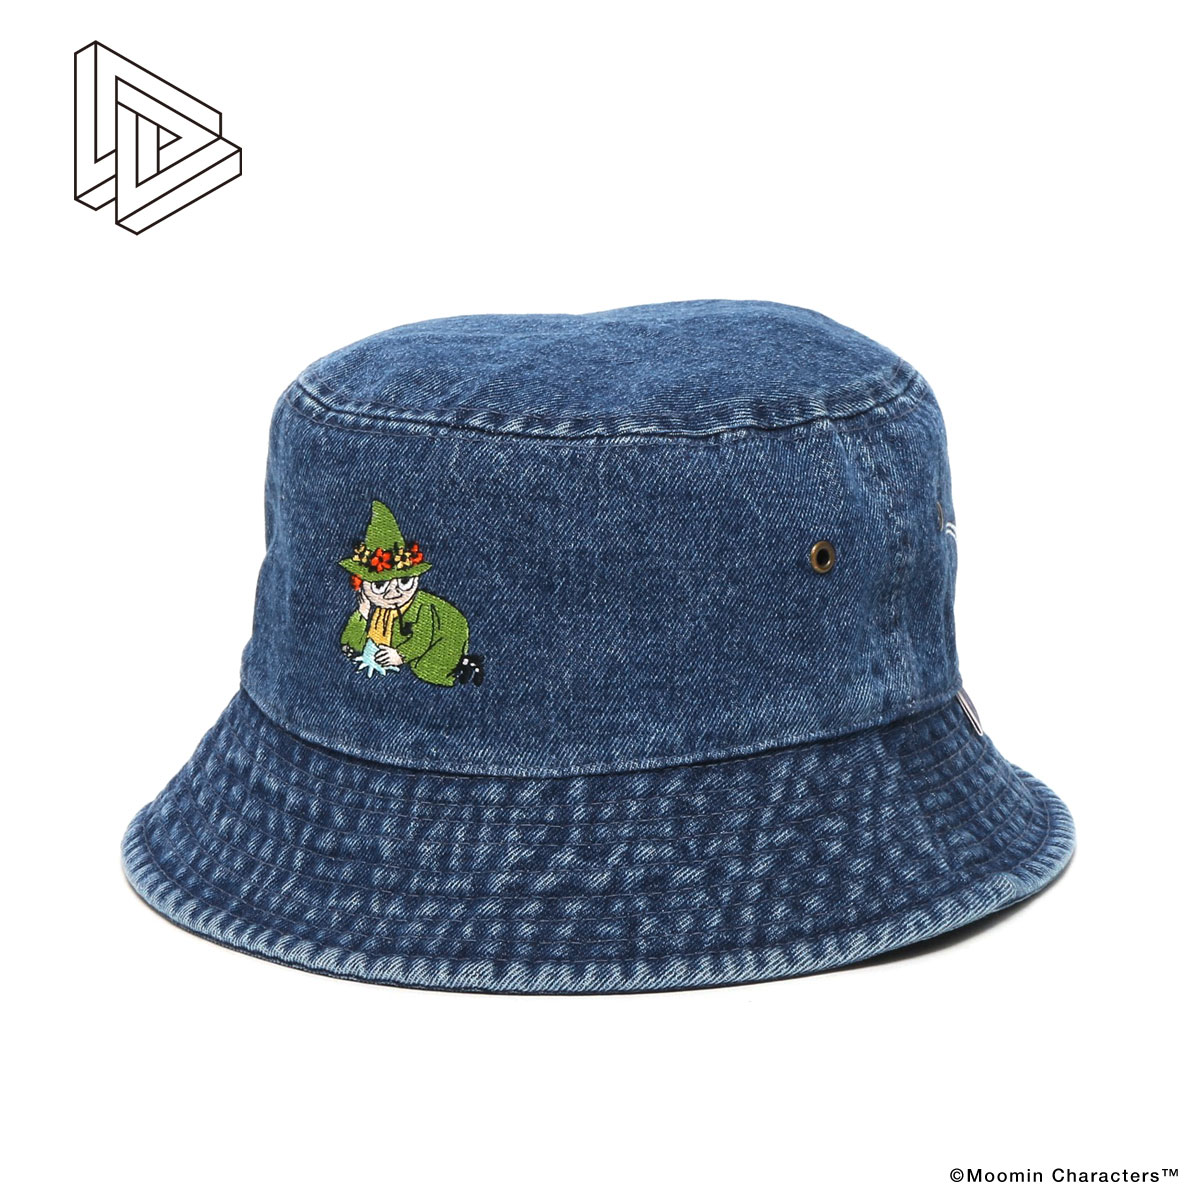 DL Headwear x MOOMIN CHILLING BUCKET HAT (three colors of development) D L  headware x Mumin climbing pail hat) 401de5565514